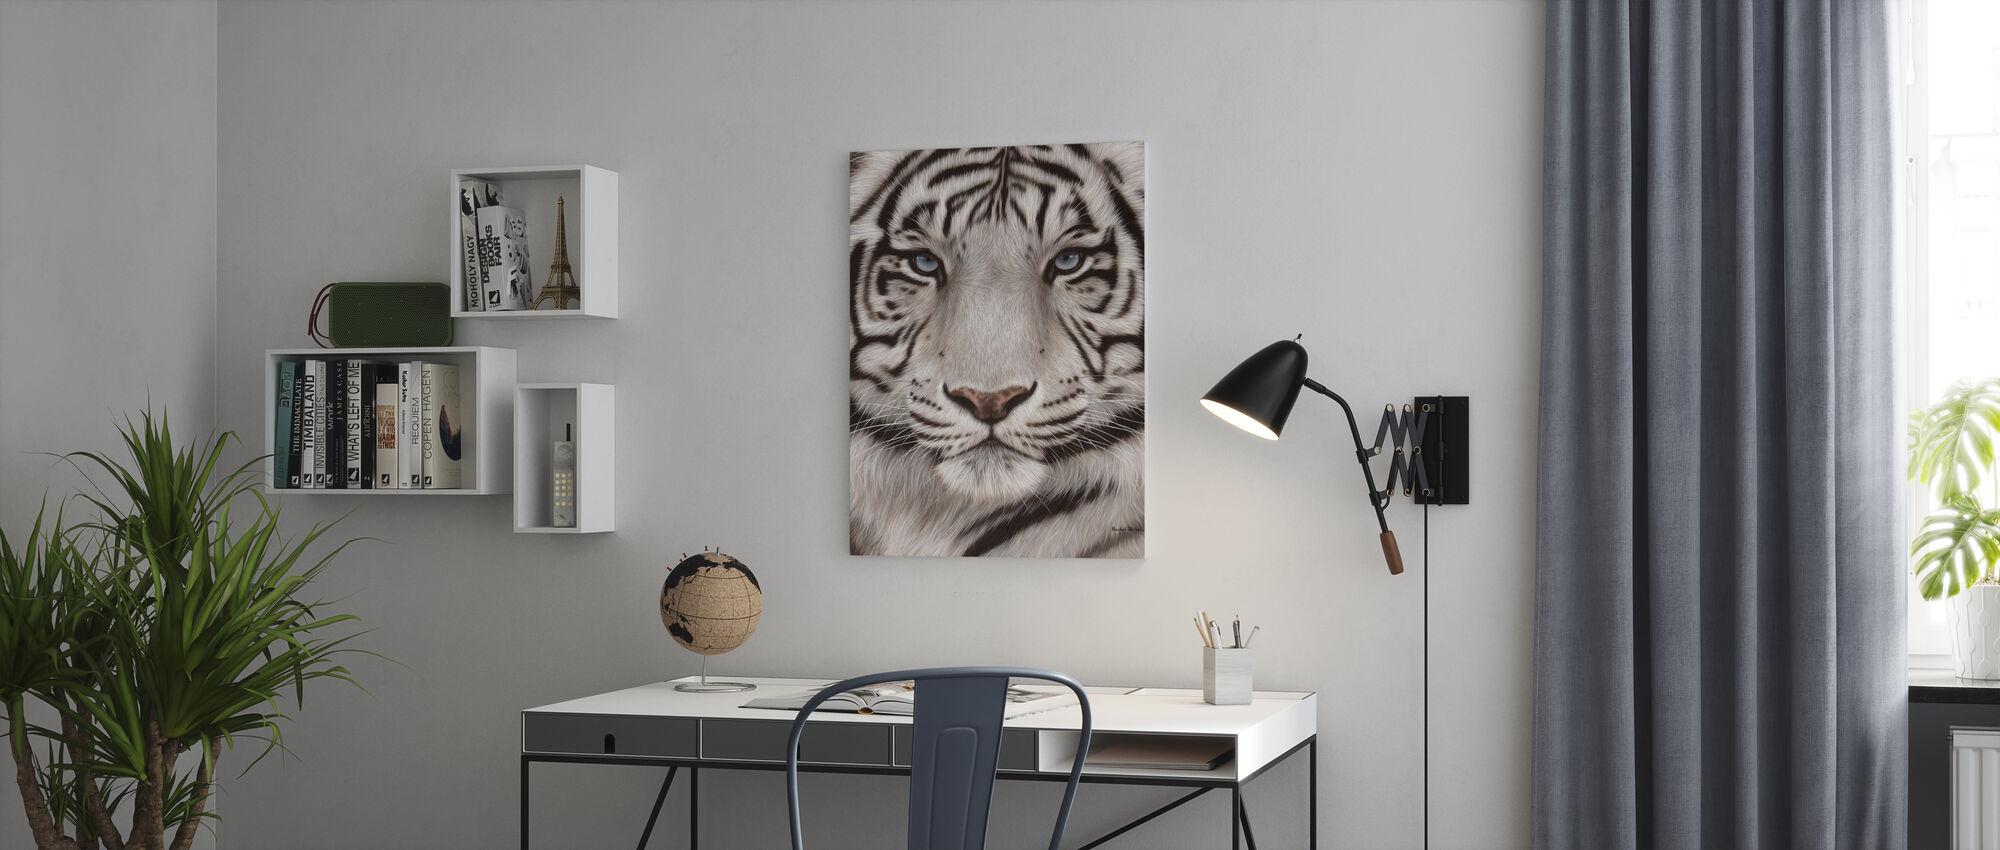 Witte Tijger Gezicht Portret - Canvas print - Kantoor